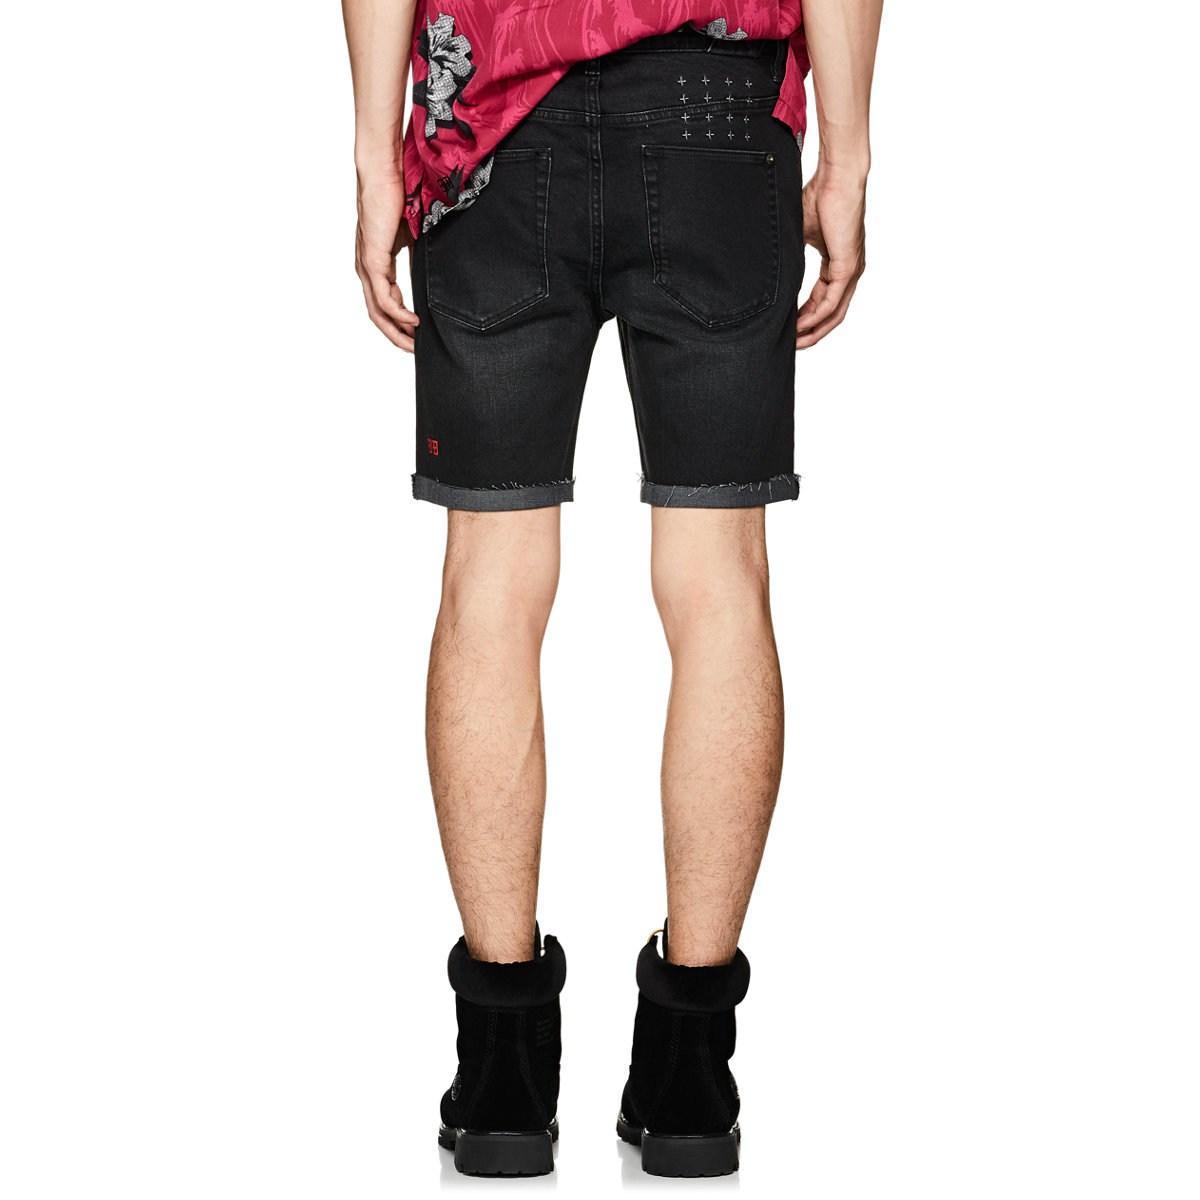 ea095f697652 Lyst - Ksubi Chopper Denim Cutoff Shorts in Black for Men